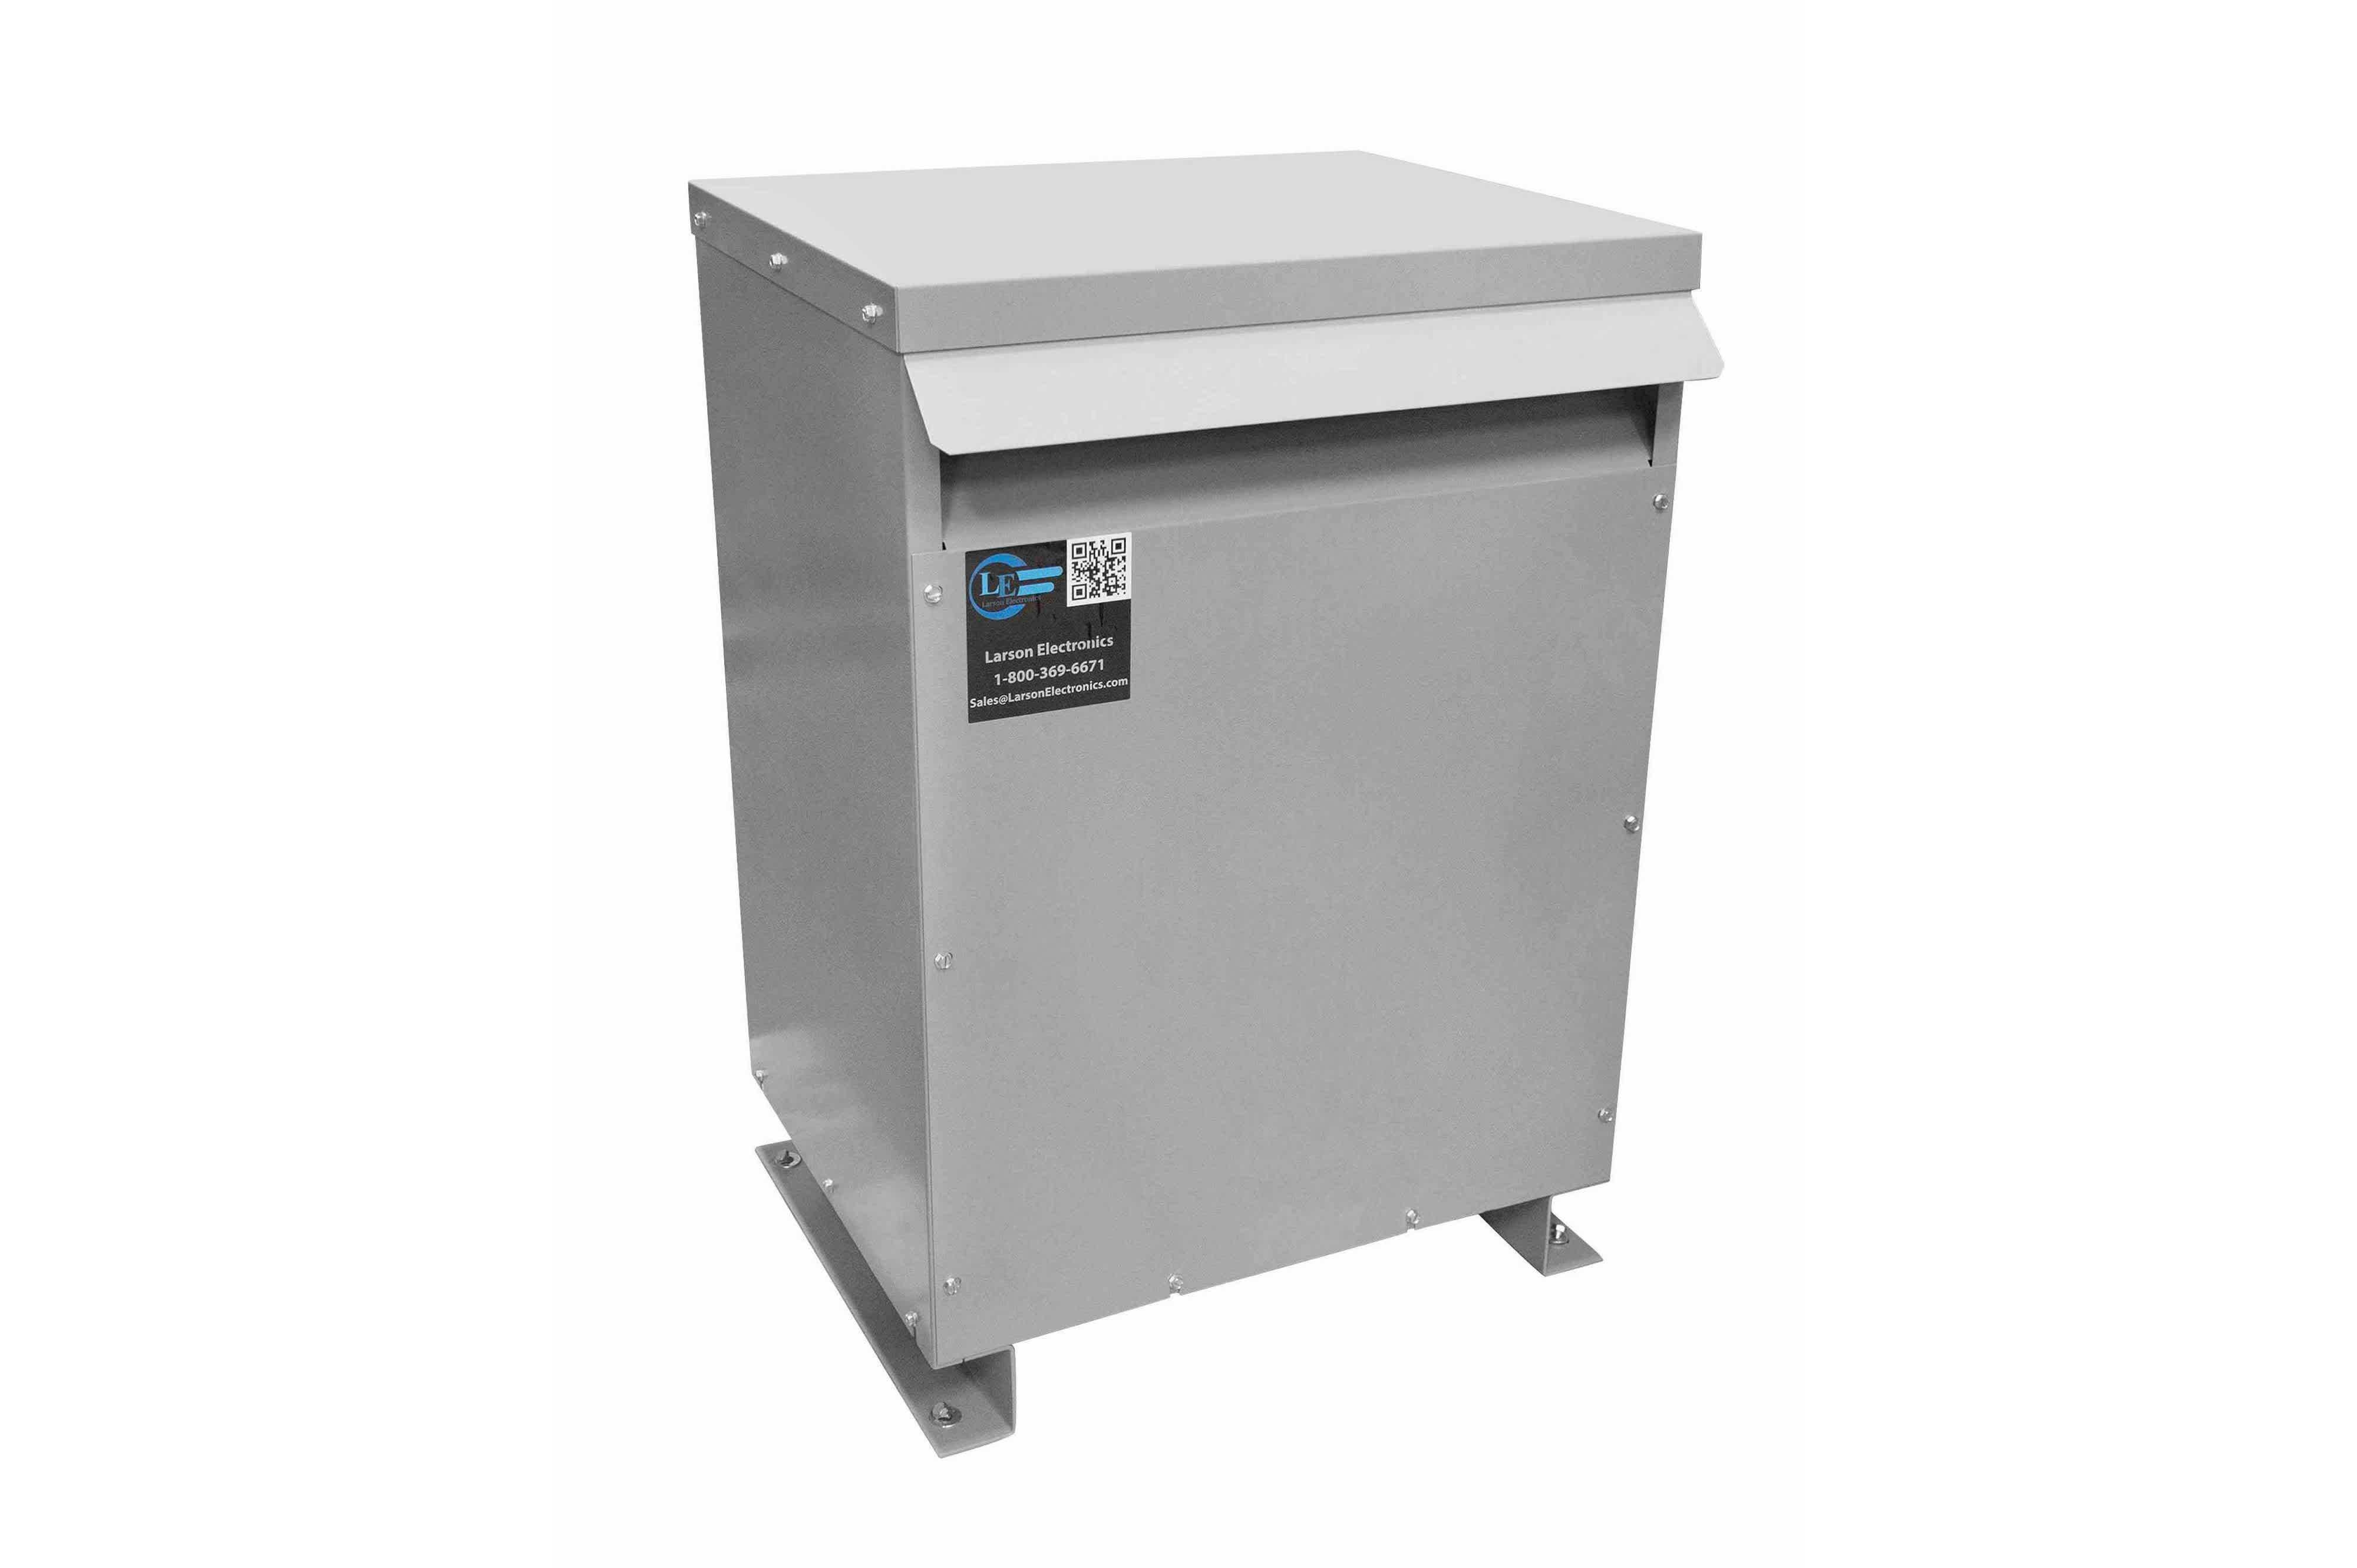 900 kVA 3PH Isolation Transformer, 600V Wye Primary, 415V Delta Secondary, N3R, Ventilated, 60 Hz